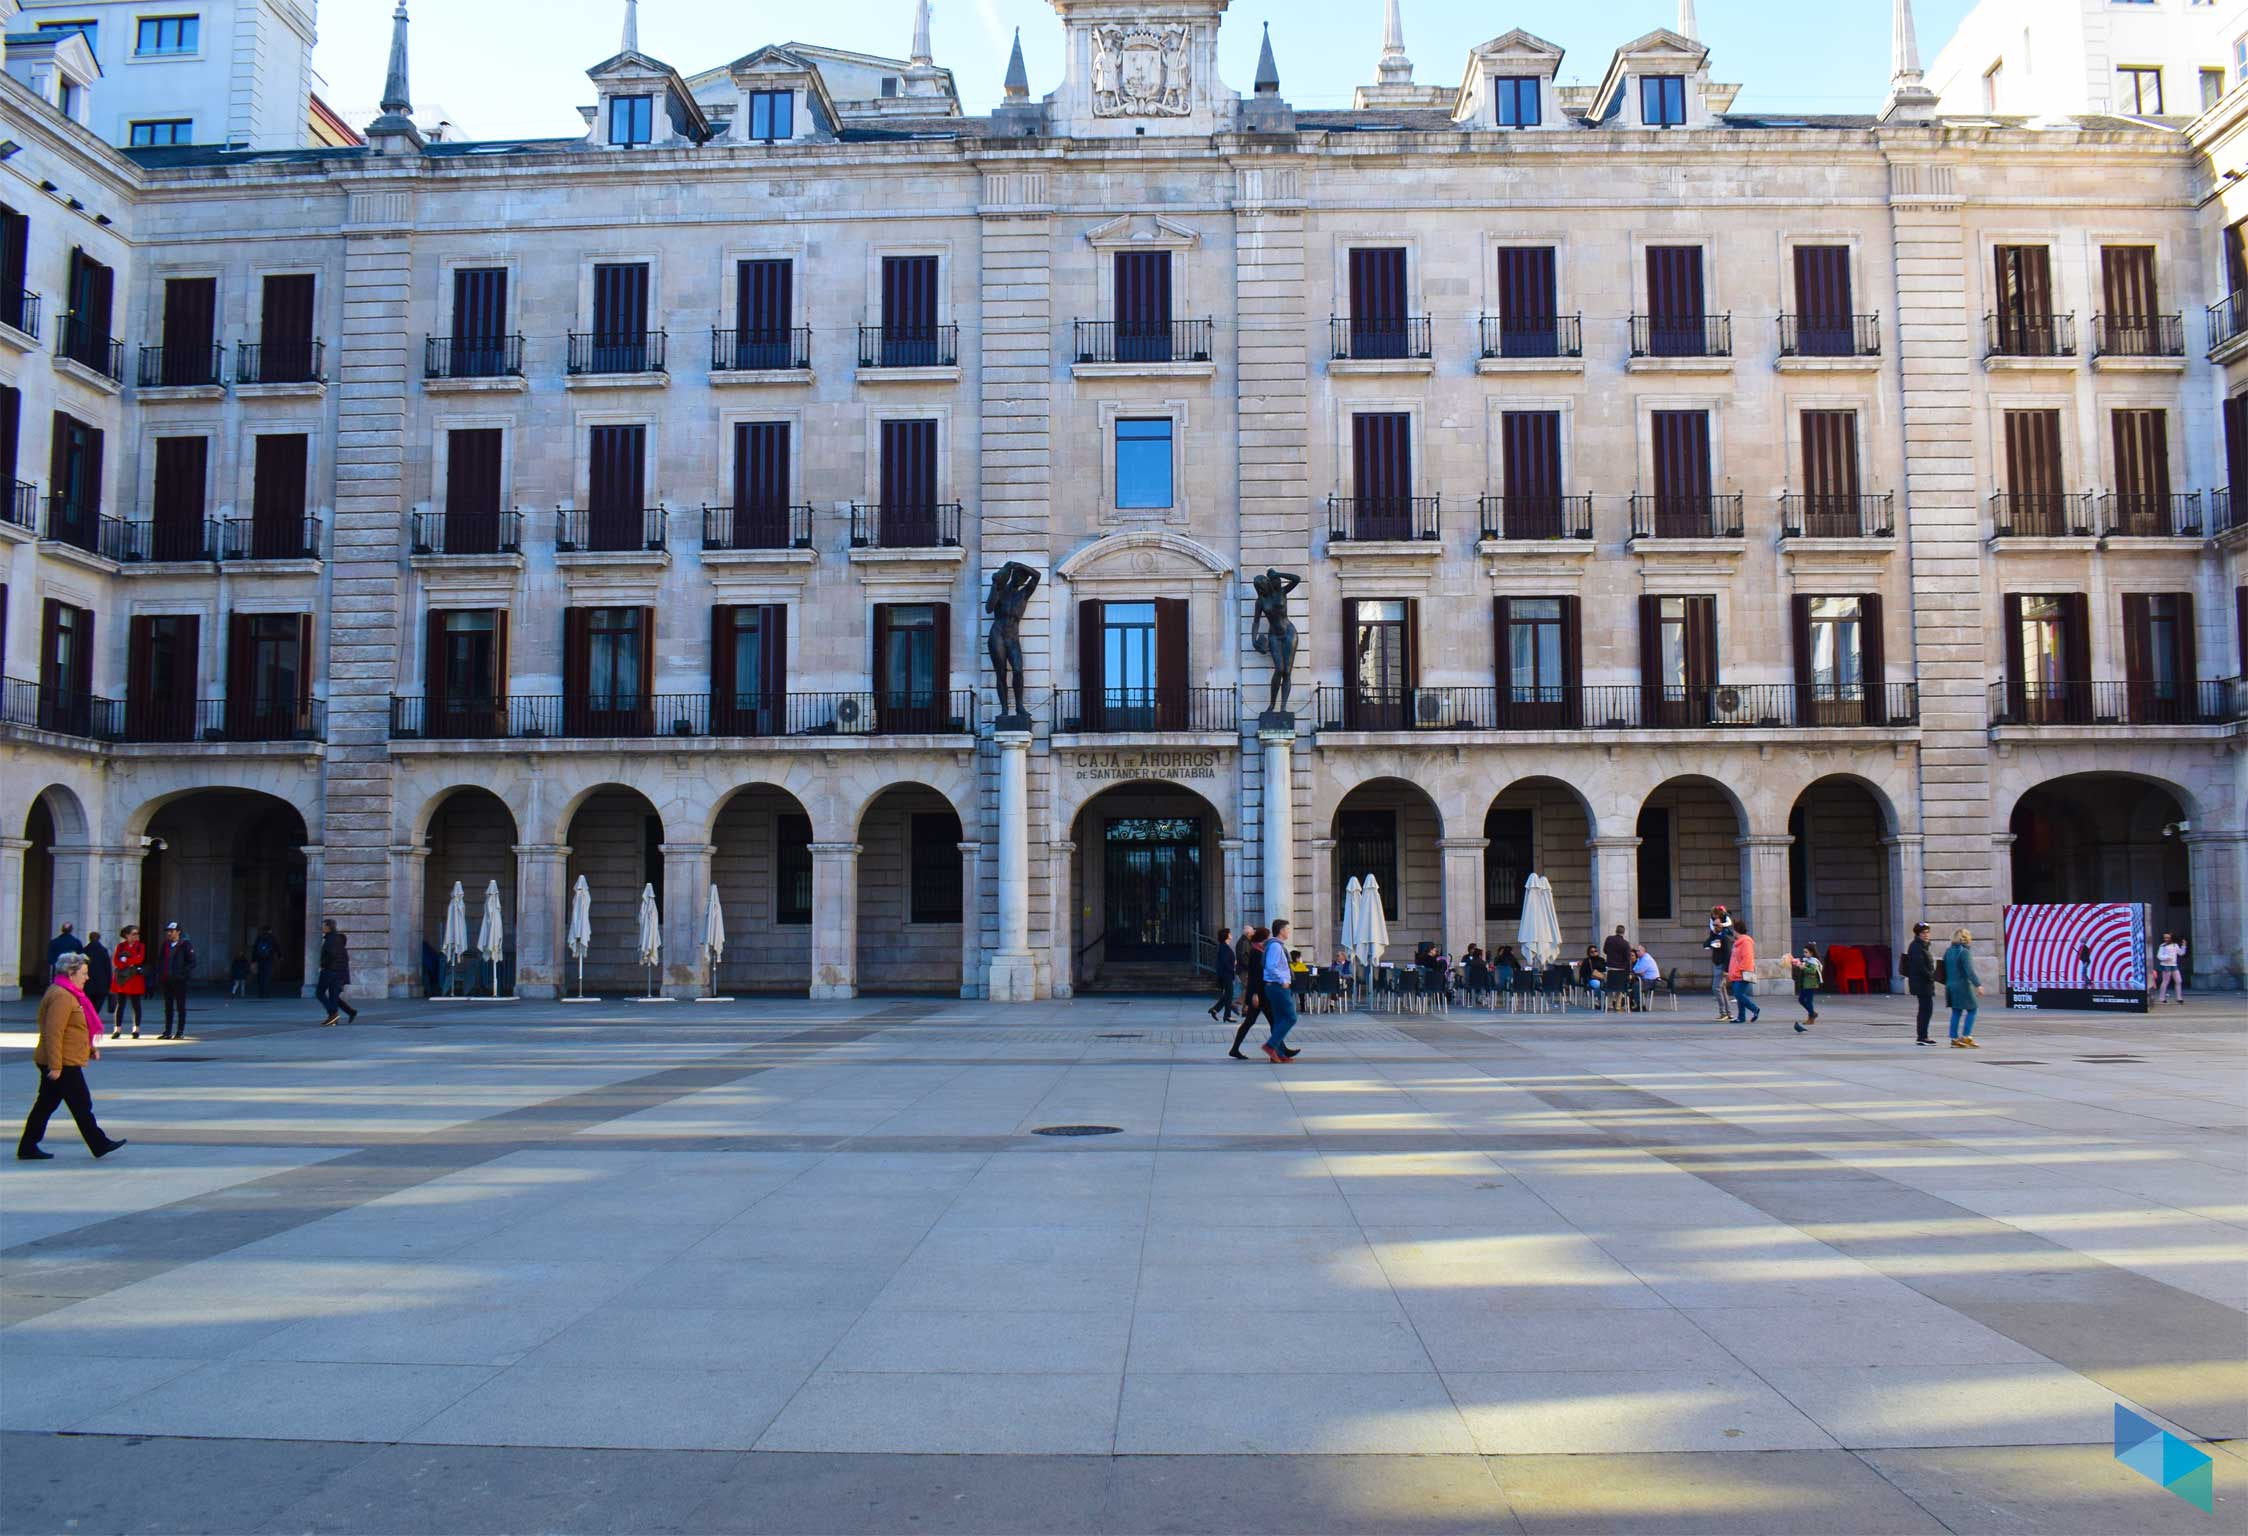 Plaza de Velarde